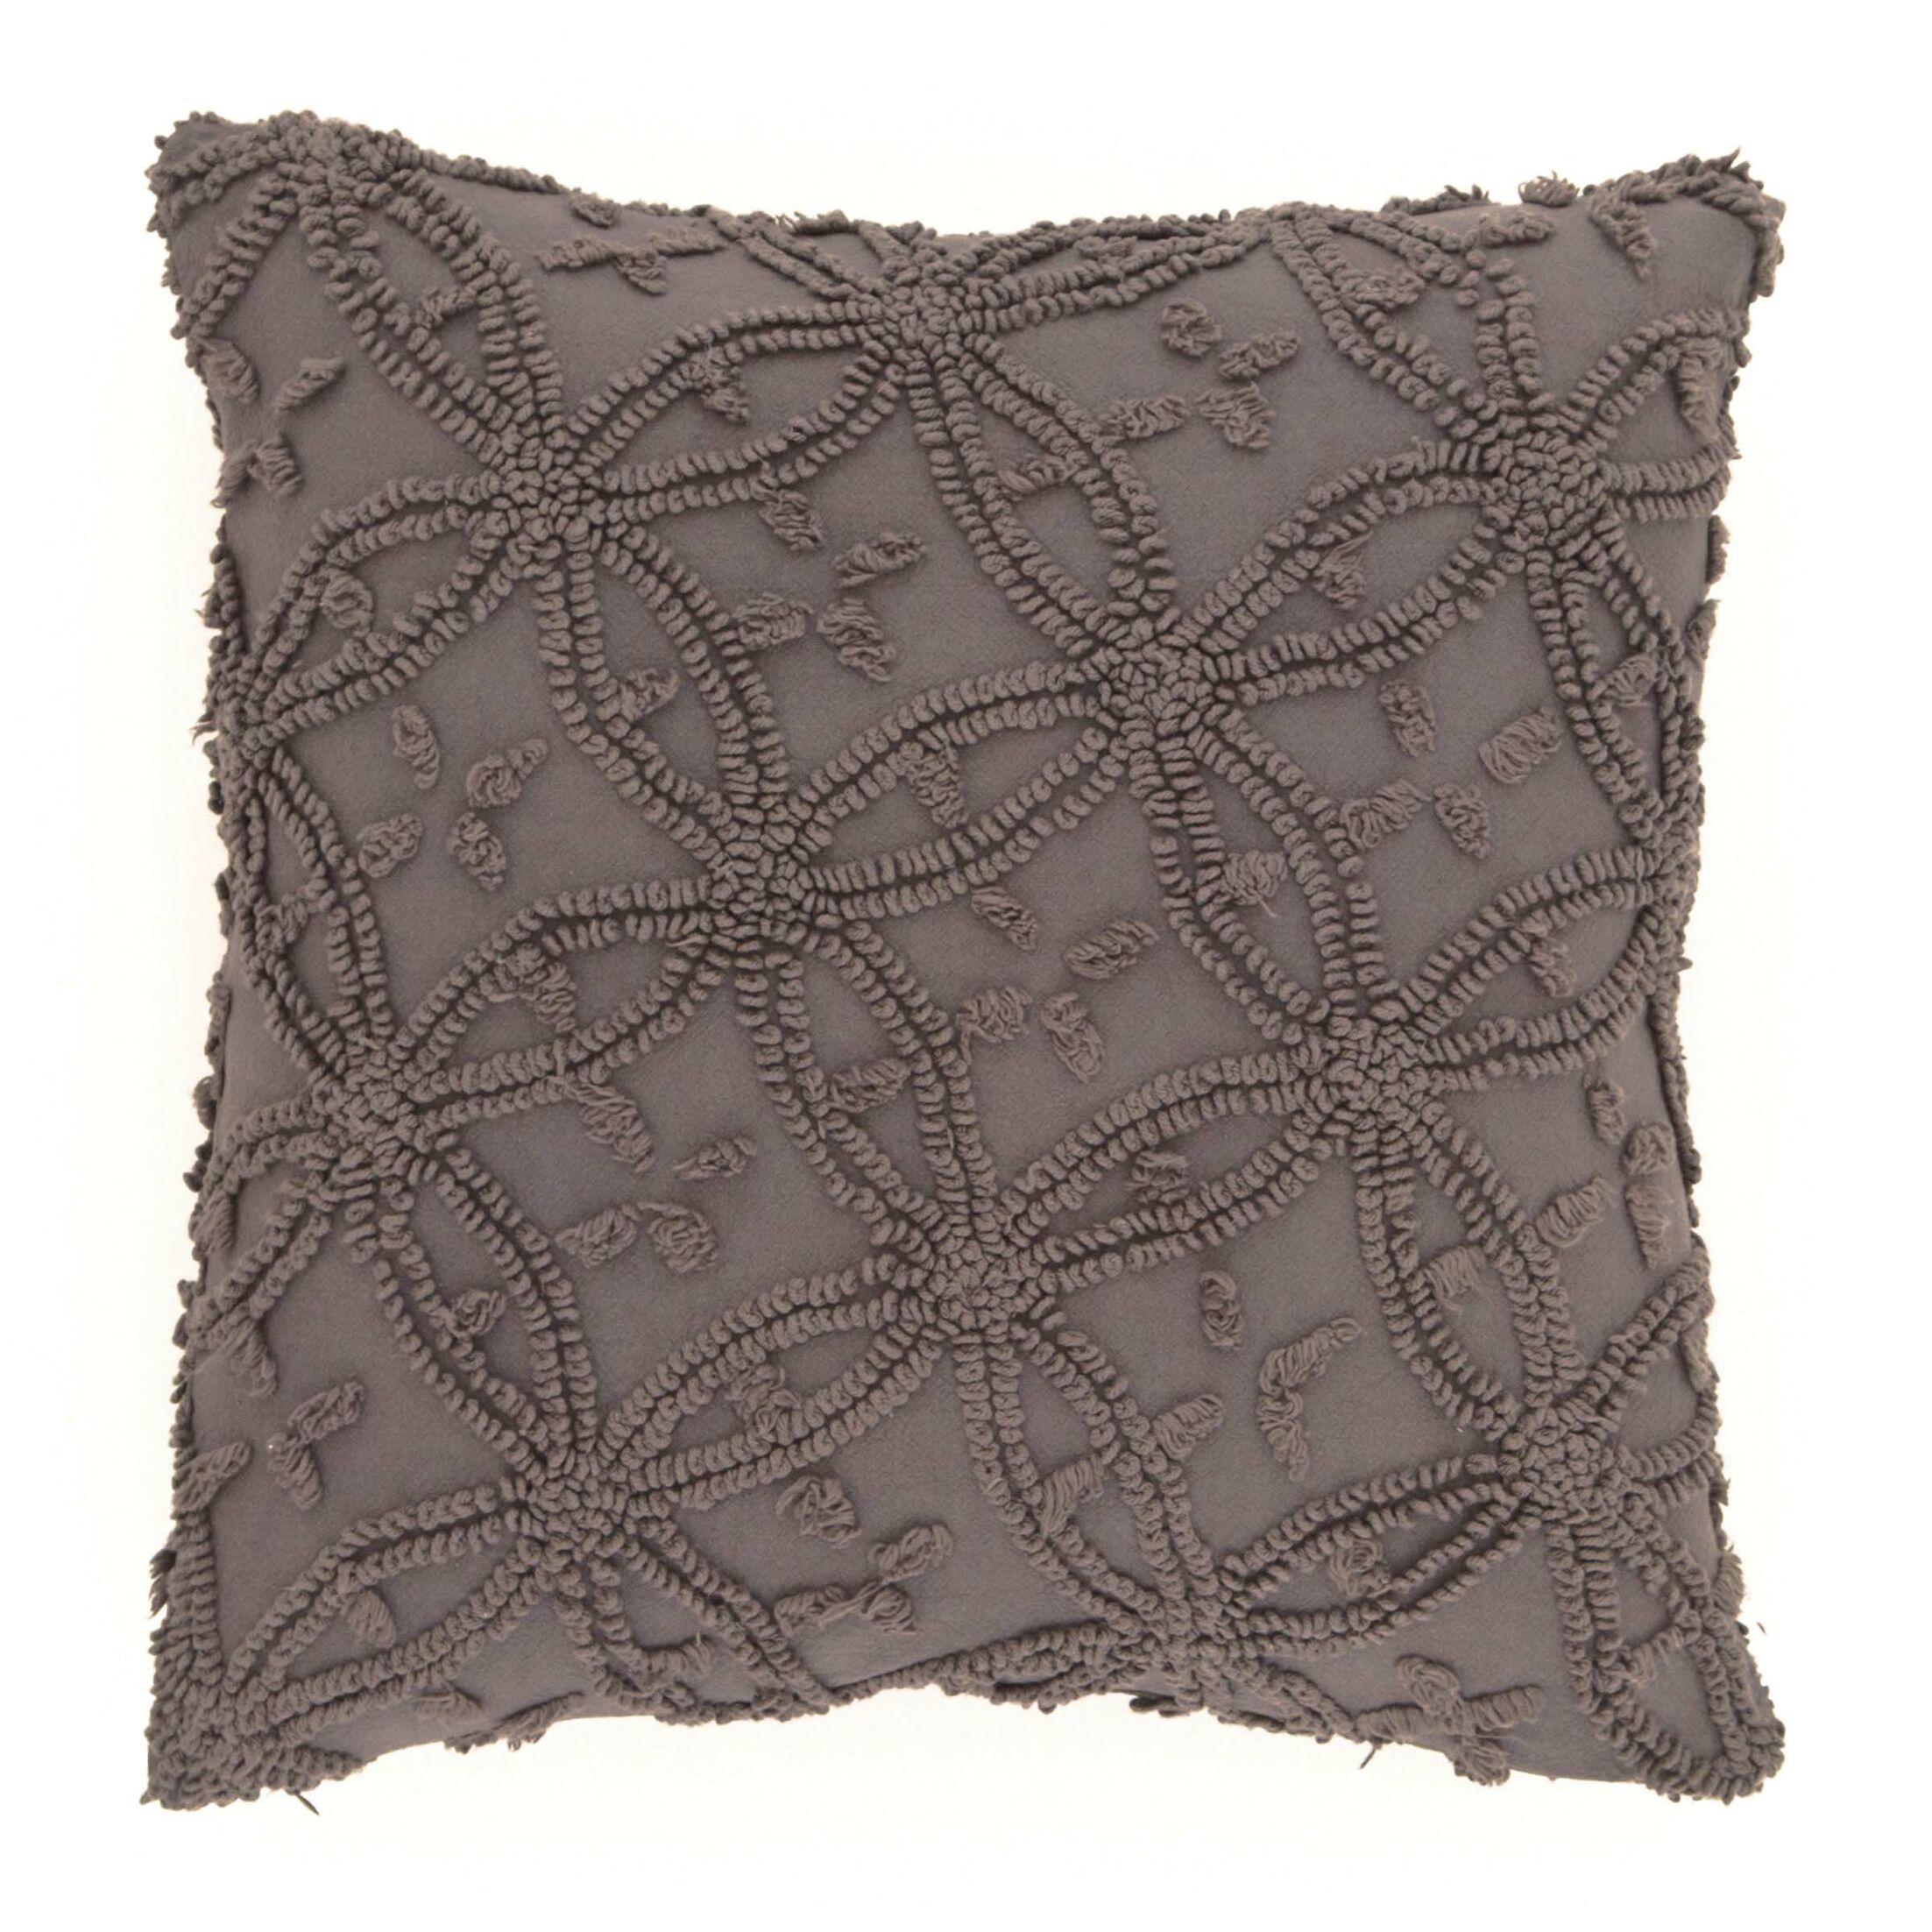 Candlewick Cotton Throw Pillow Size: 26